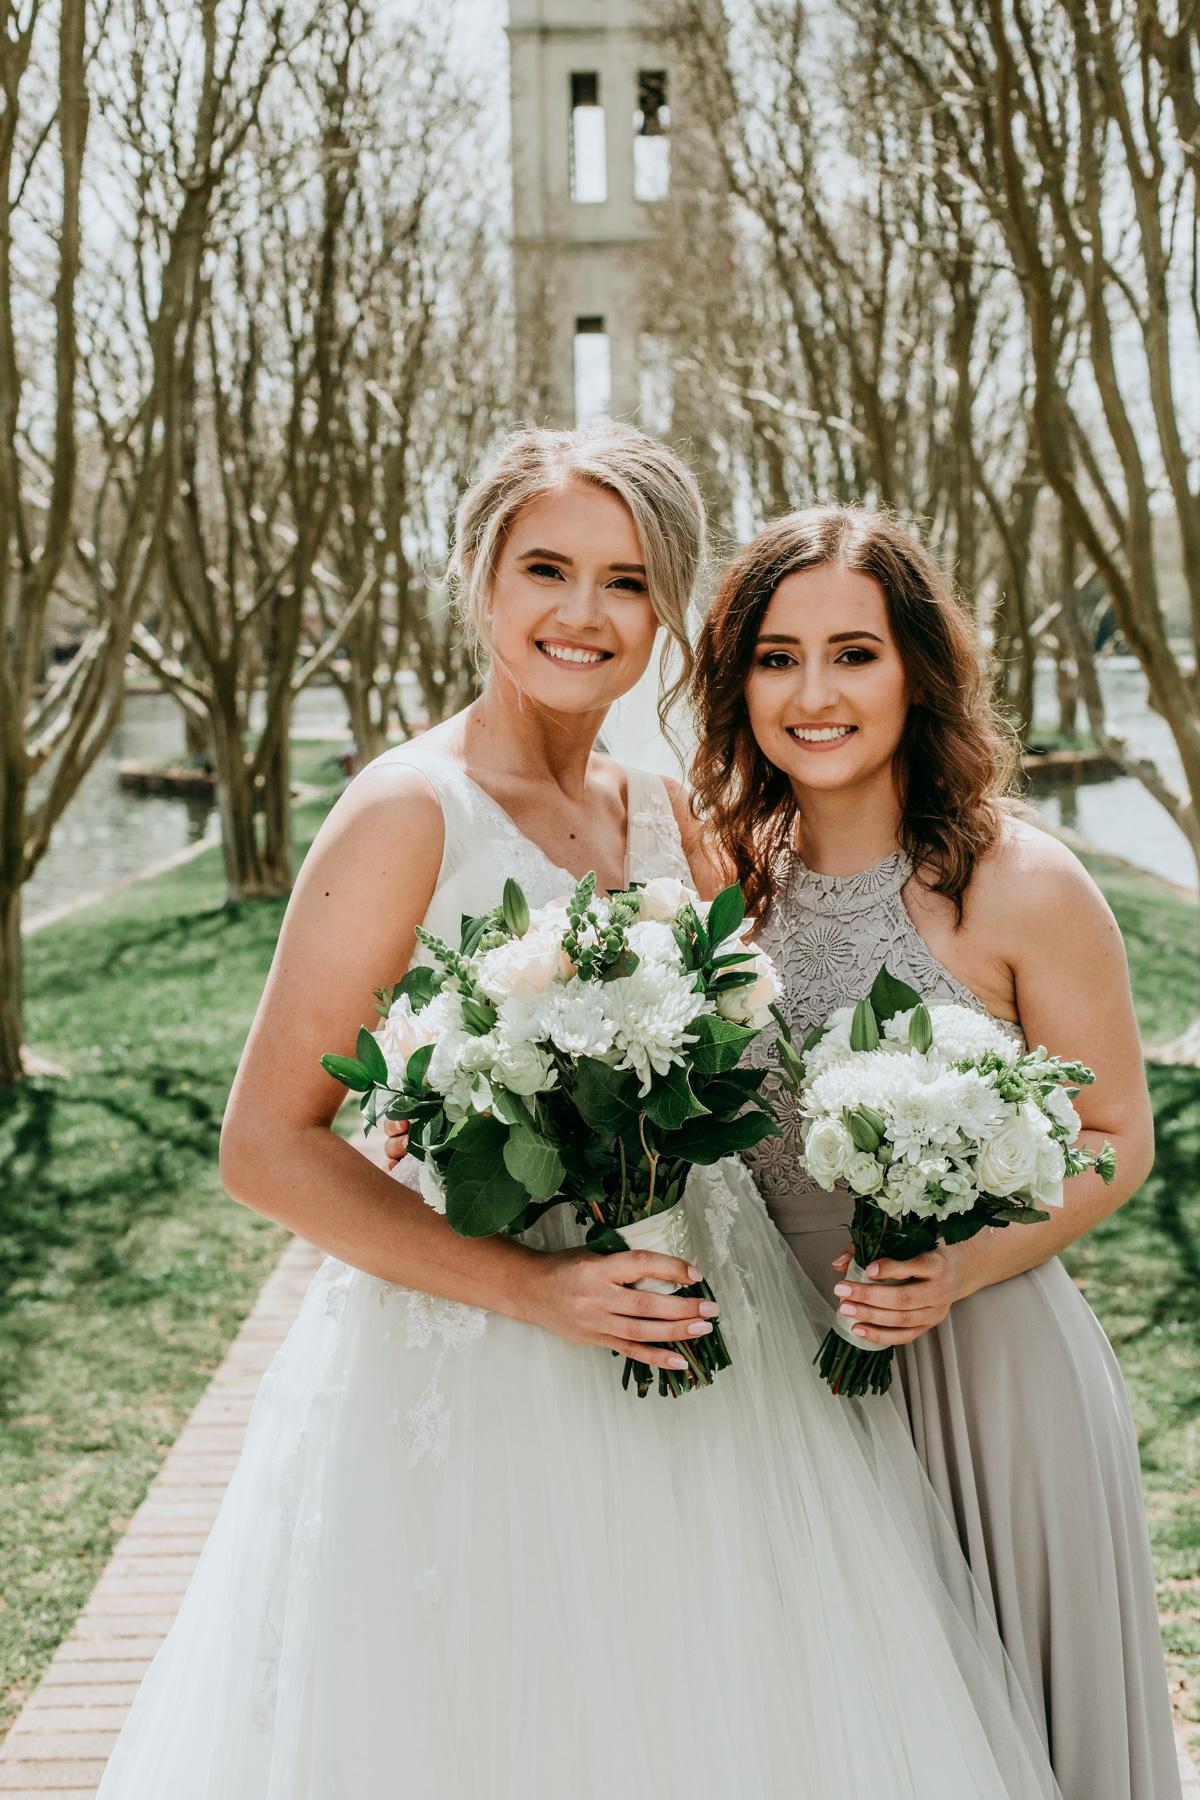 bridesmaid-and-bride-photo-session.jpg